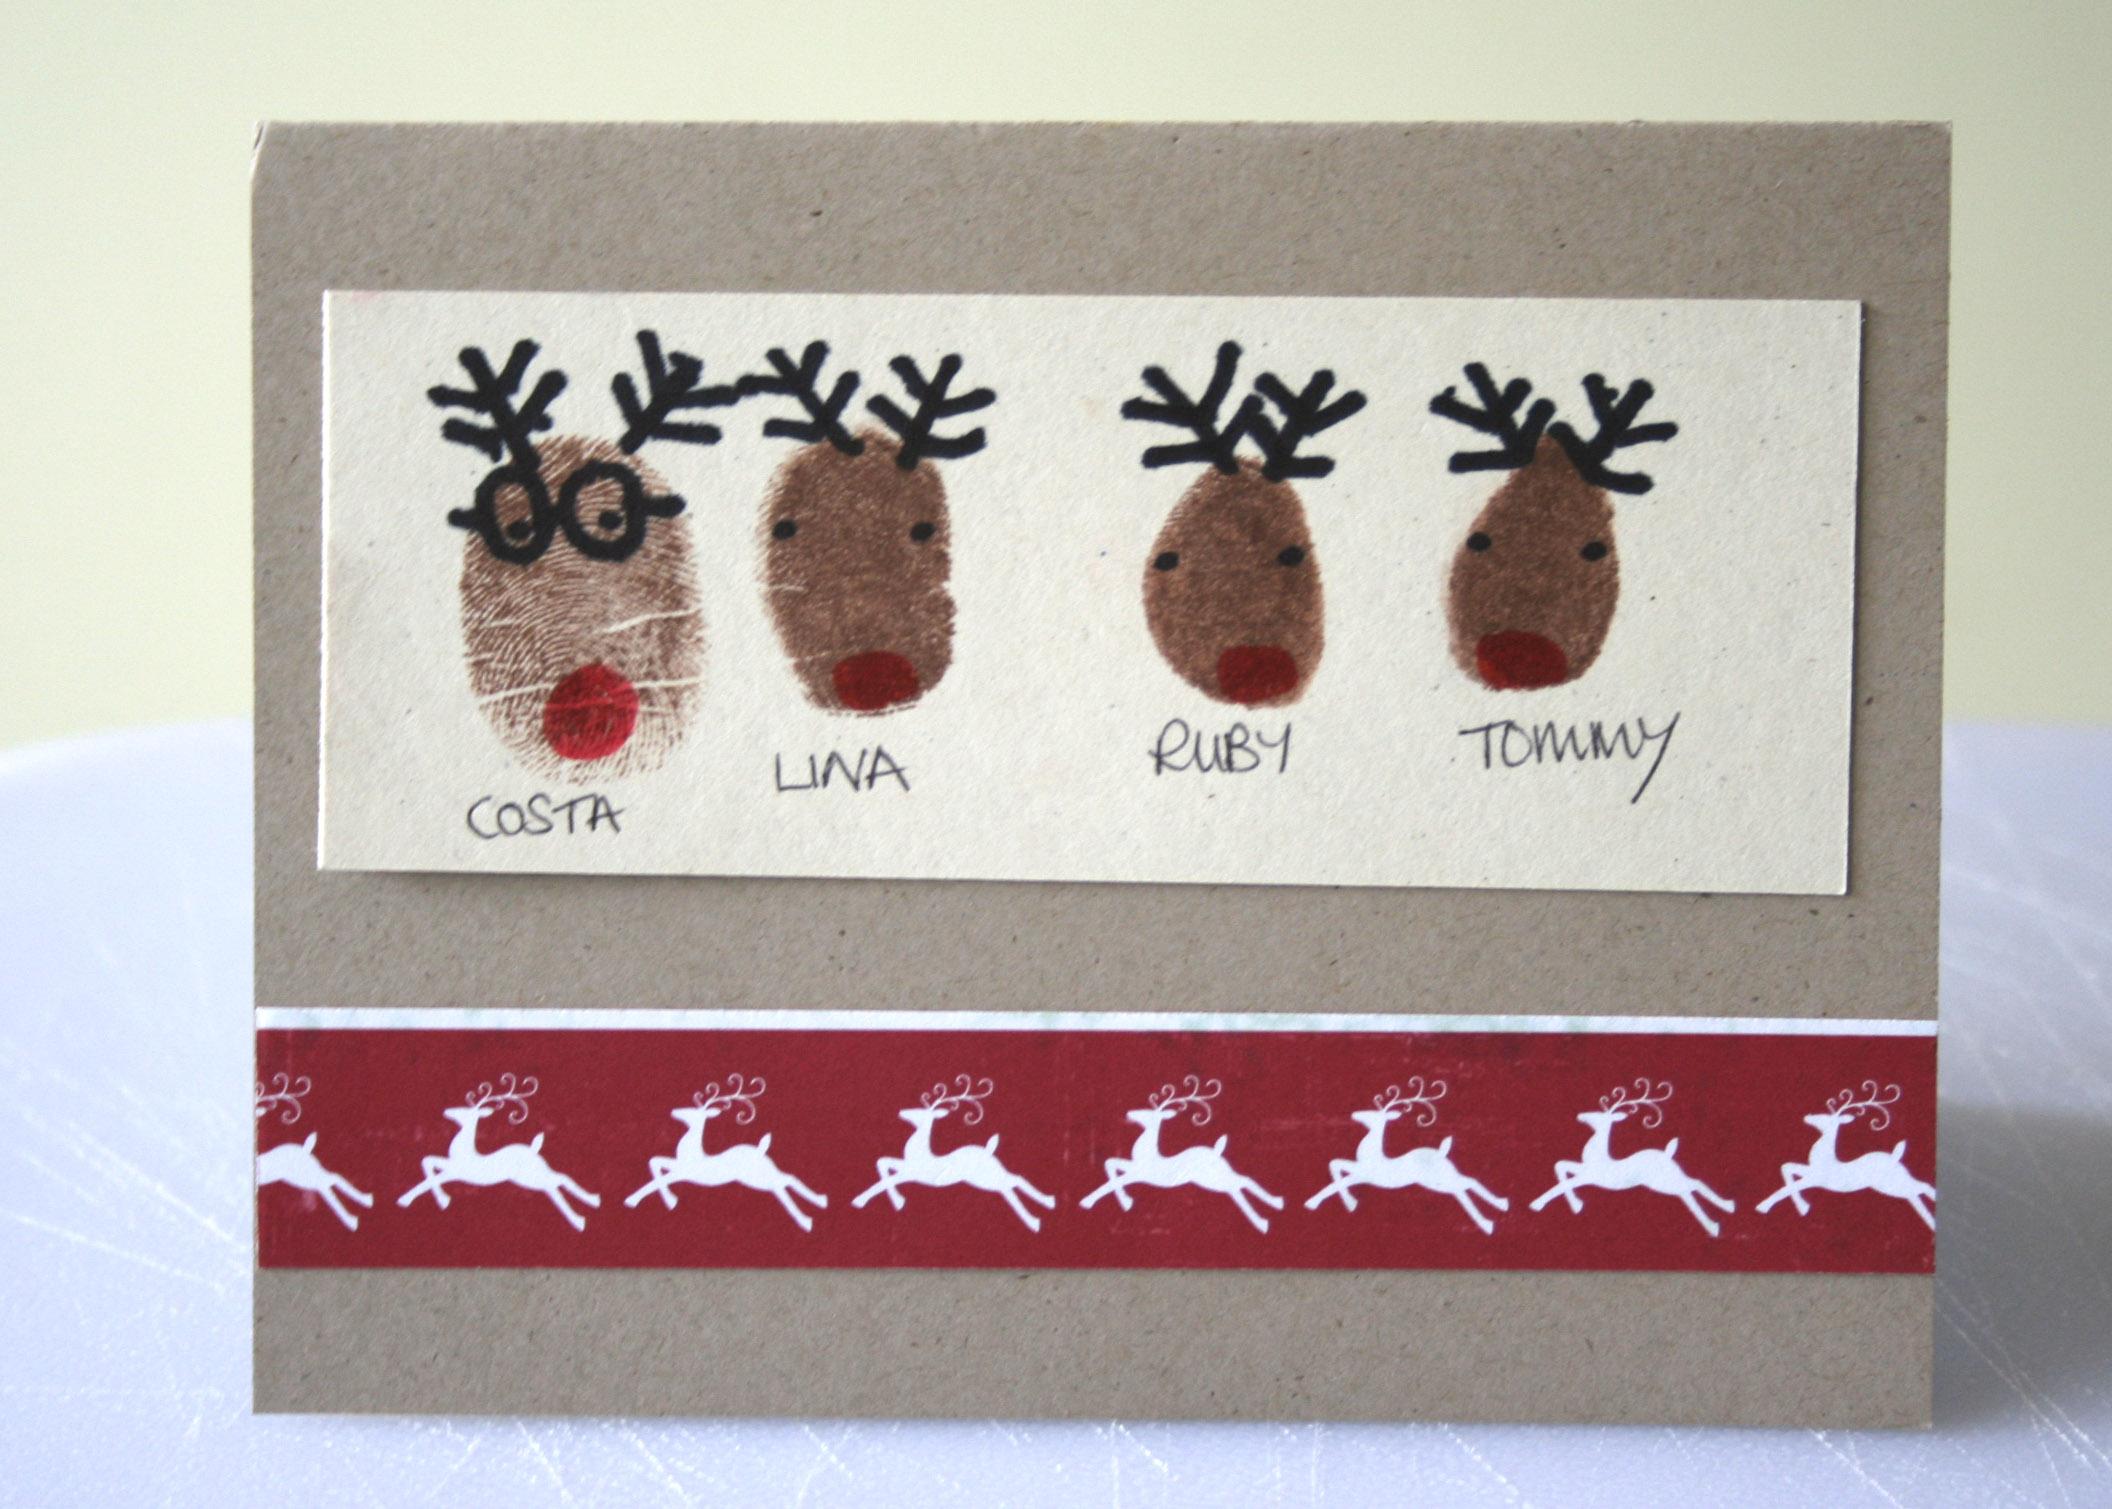 Reindeer Christmas Cards Hand Prints.This Year S Christmas Cards Linaloo